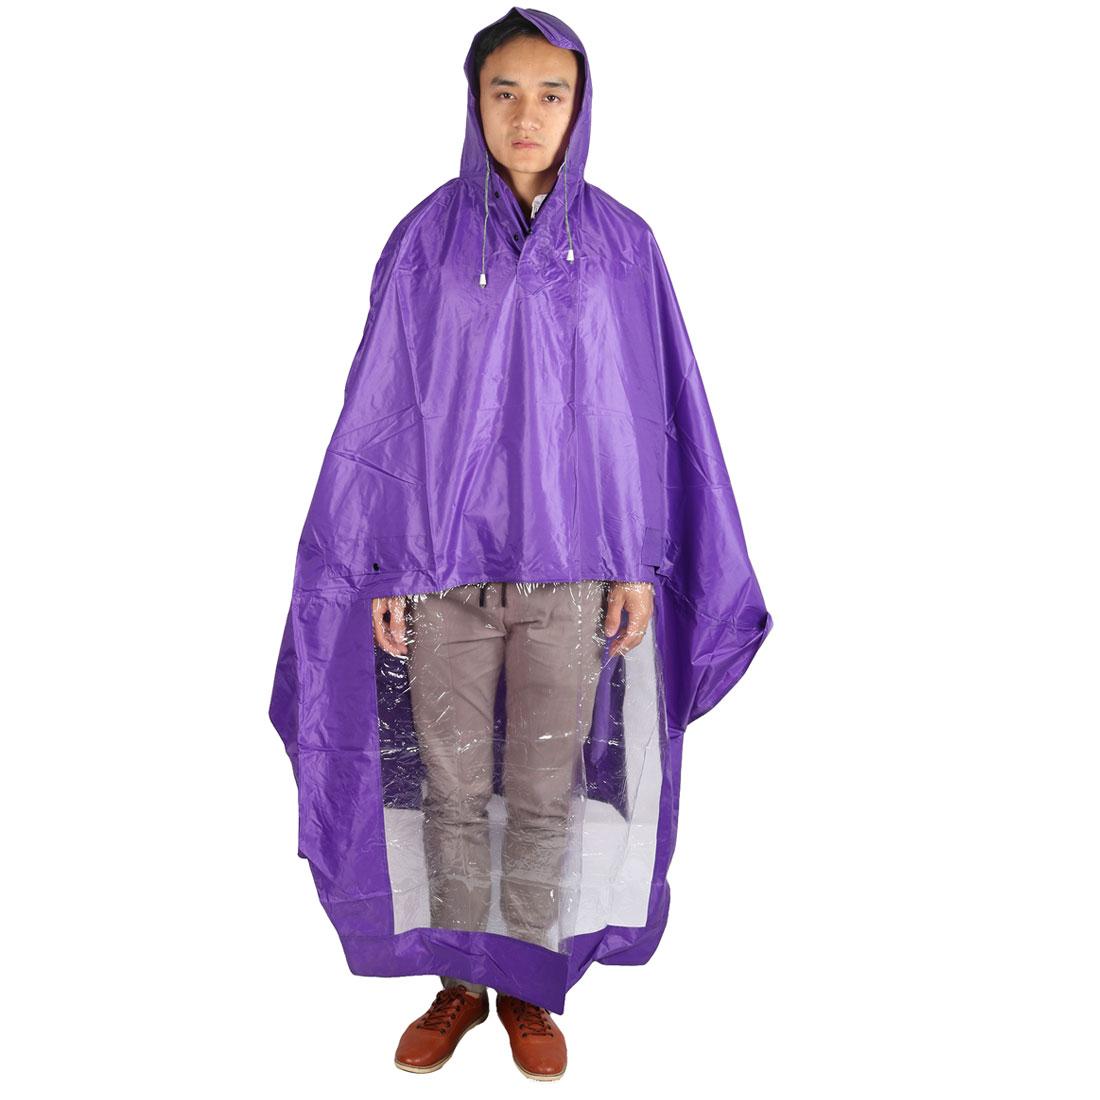 Outdoor Motorcycle Scooter Plastic Cover Water Resistant Dustproof Raincoat Protector Purple